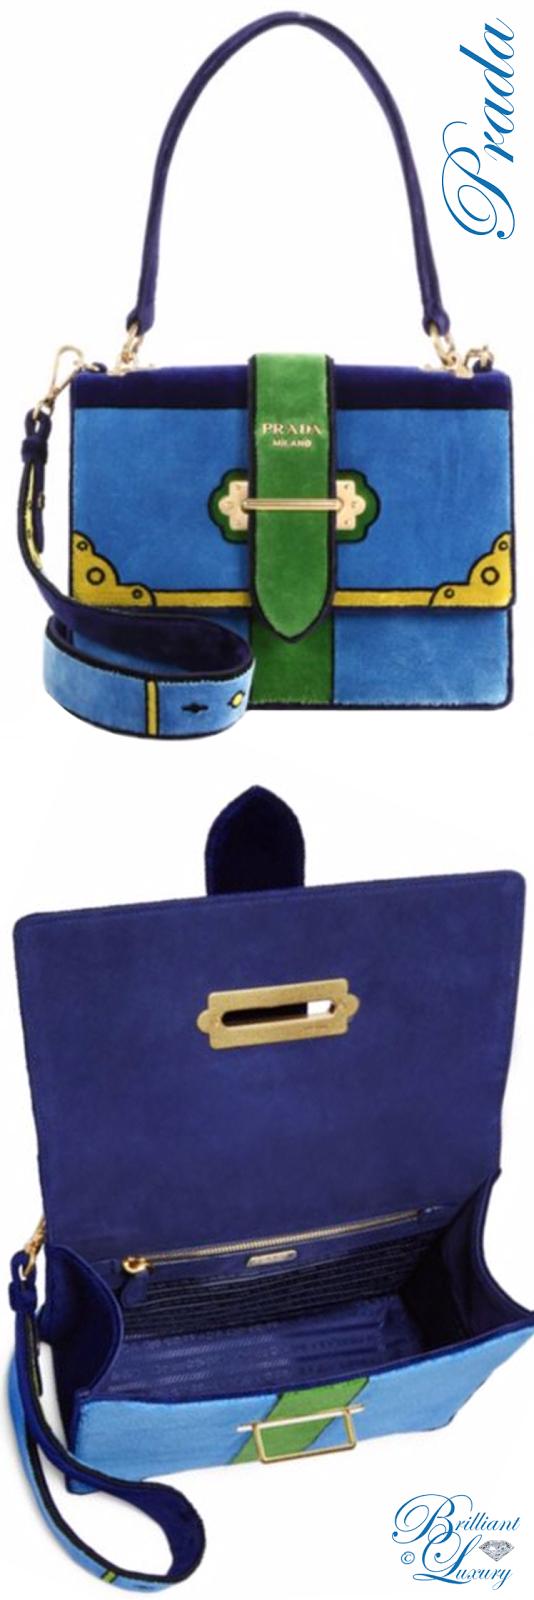 Brilliant Luxury ♦ Prada Cahier Colorblock Velvet Handbag